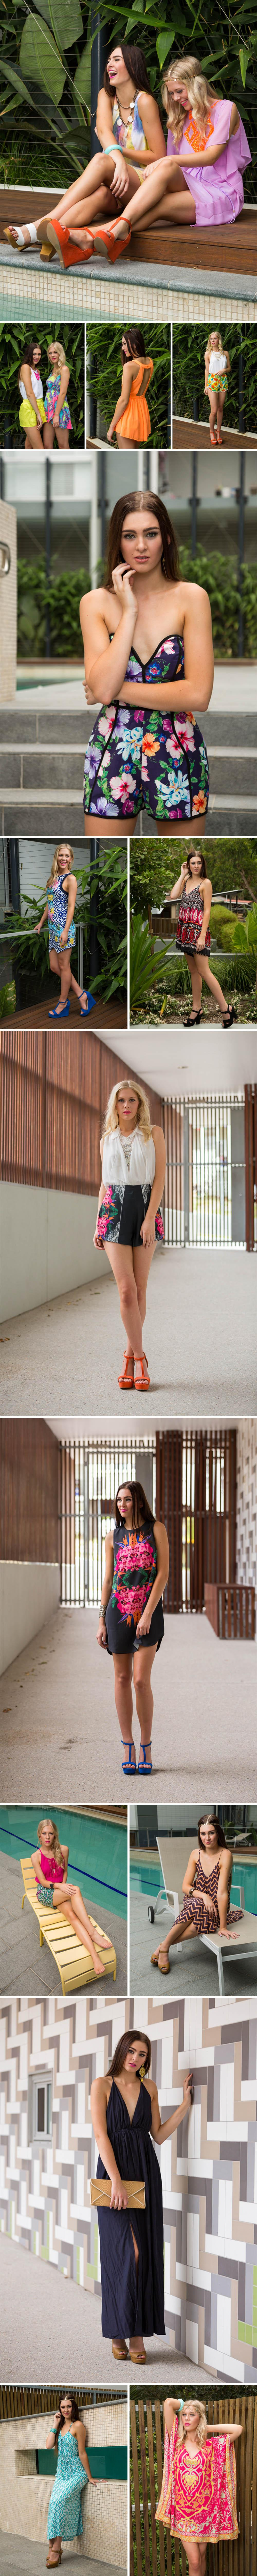 Brisbane Toowoomba fashion photographer Tim Swinson